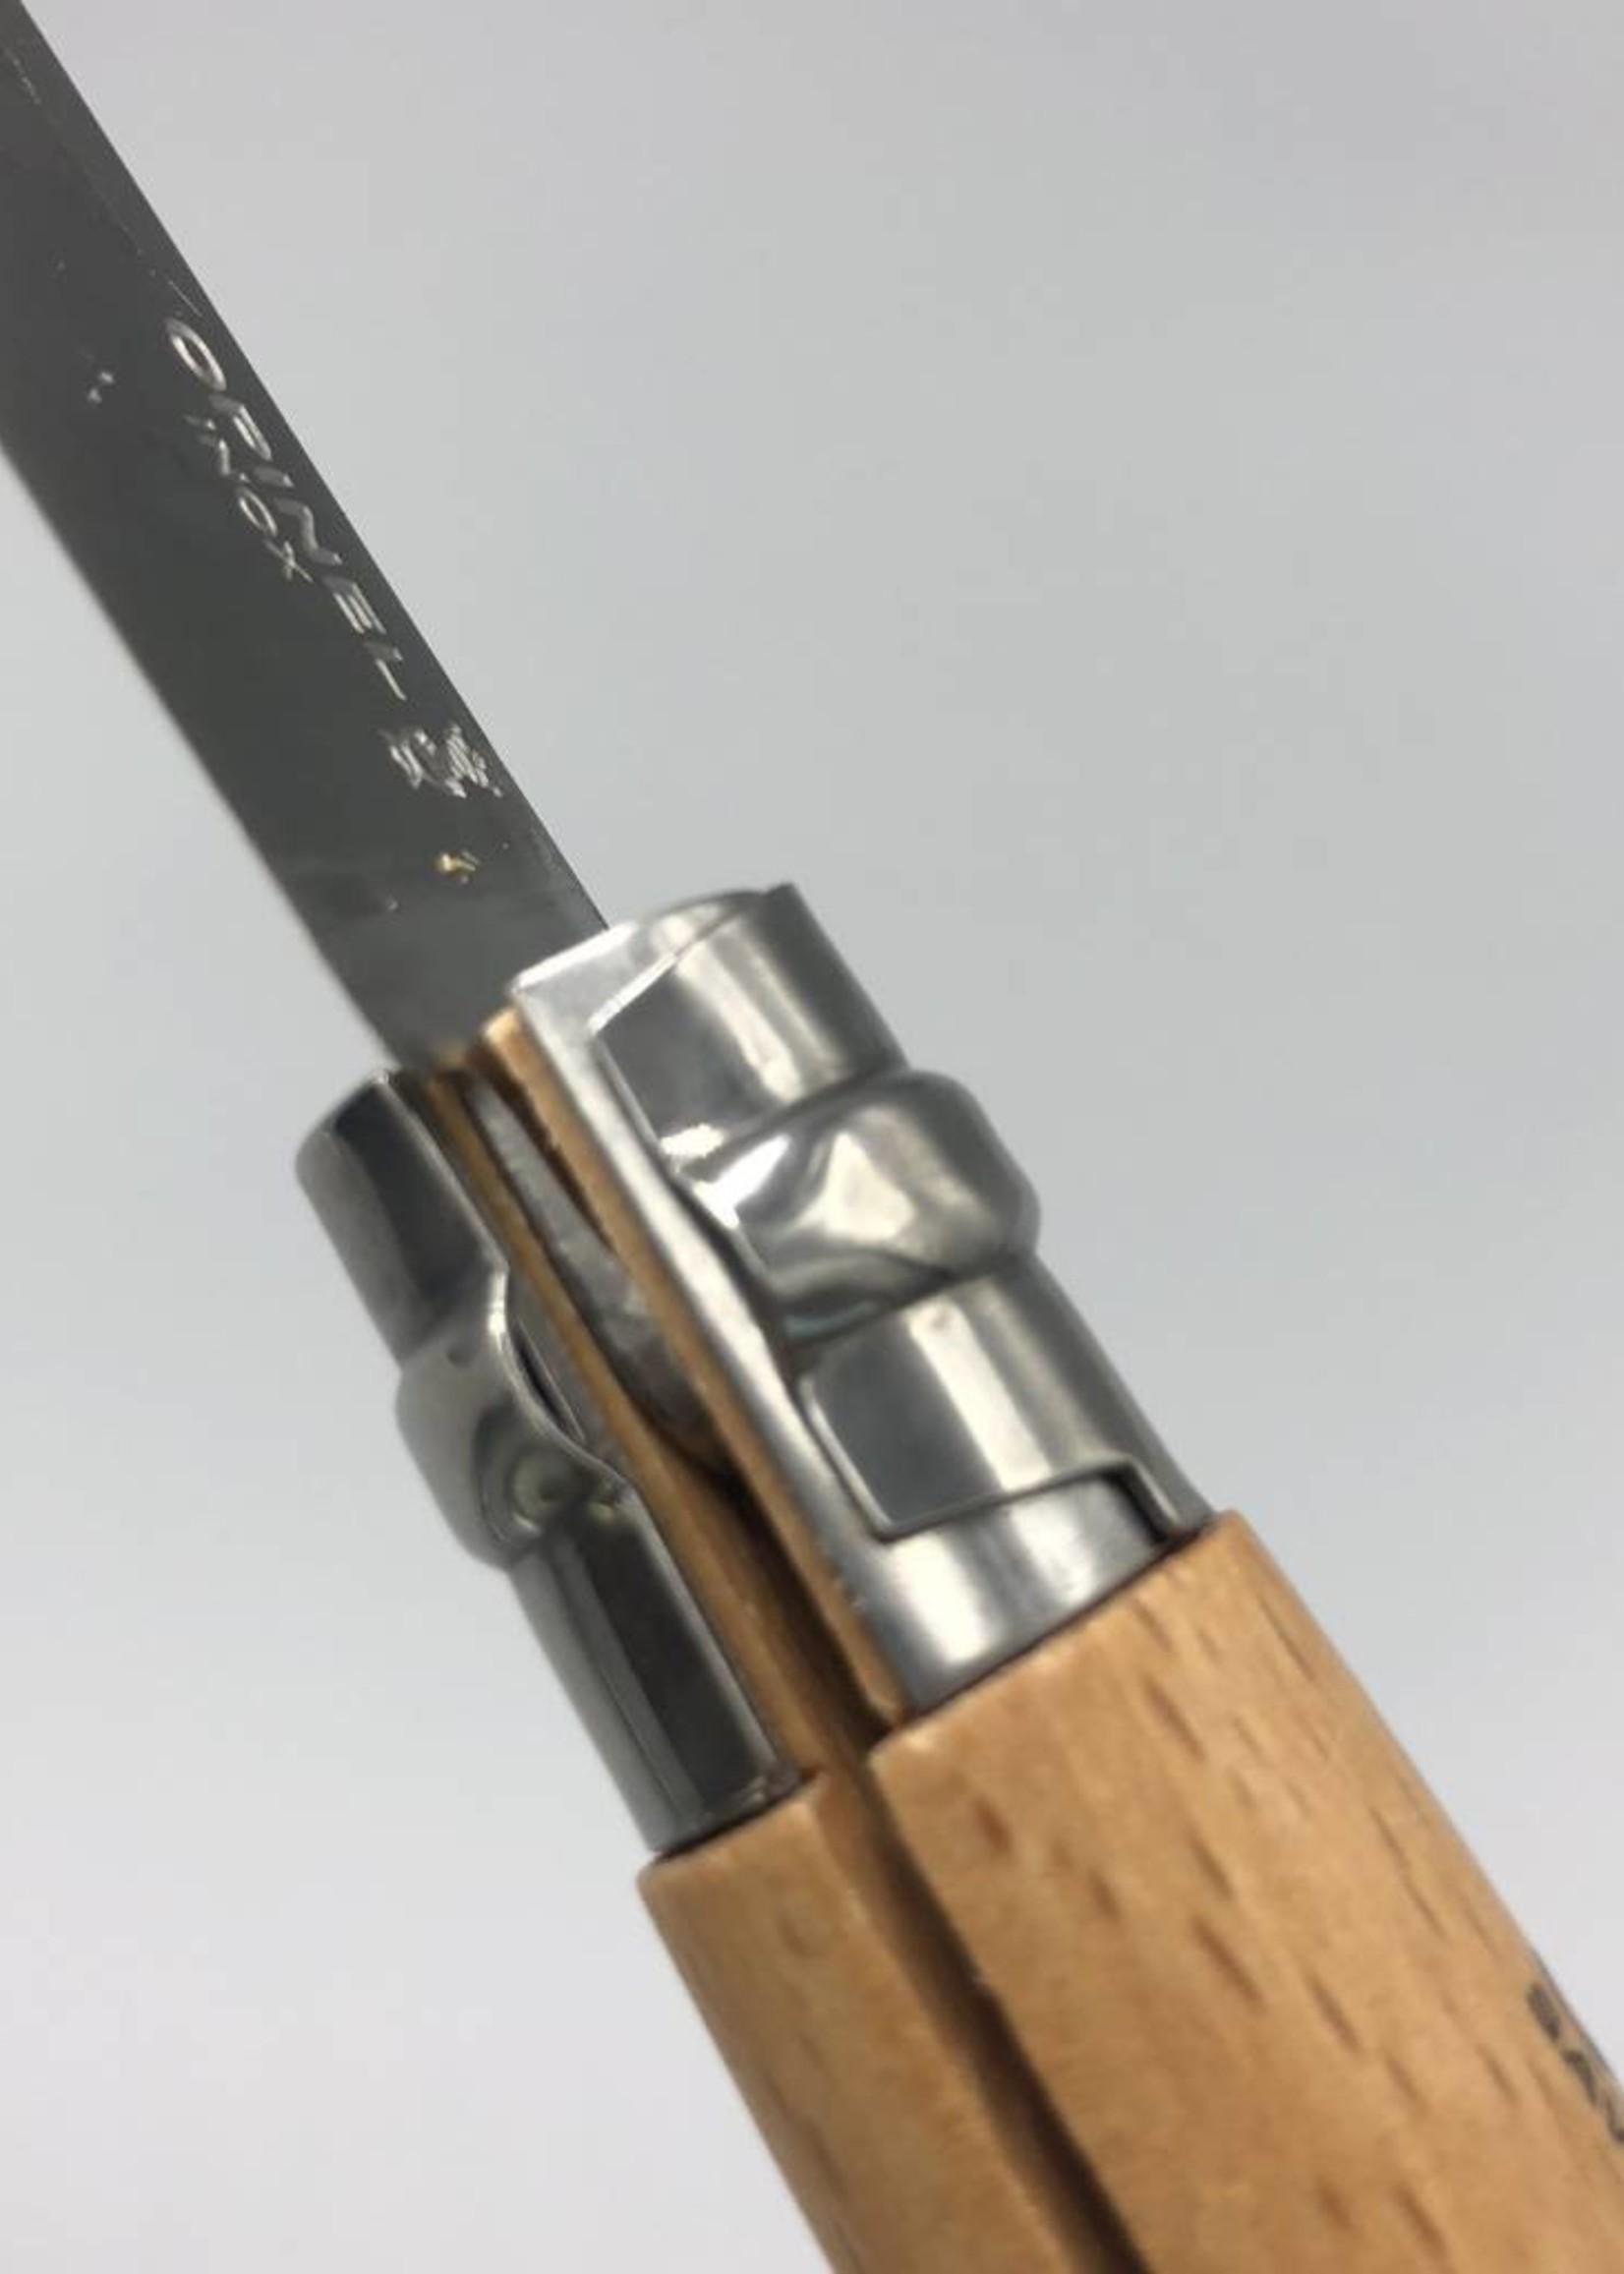 Opinel No 10 Corkscrew Folding Knife